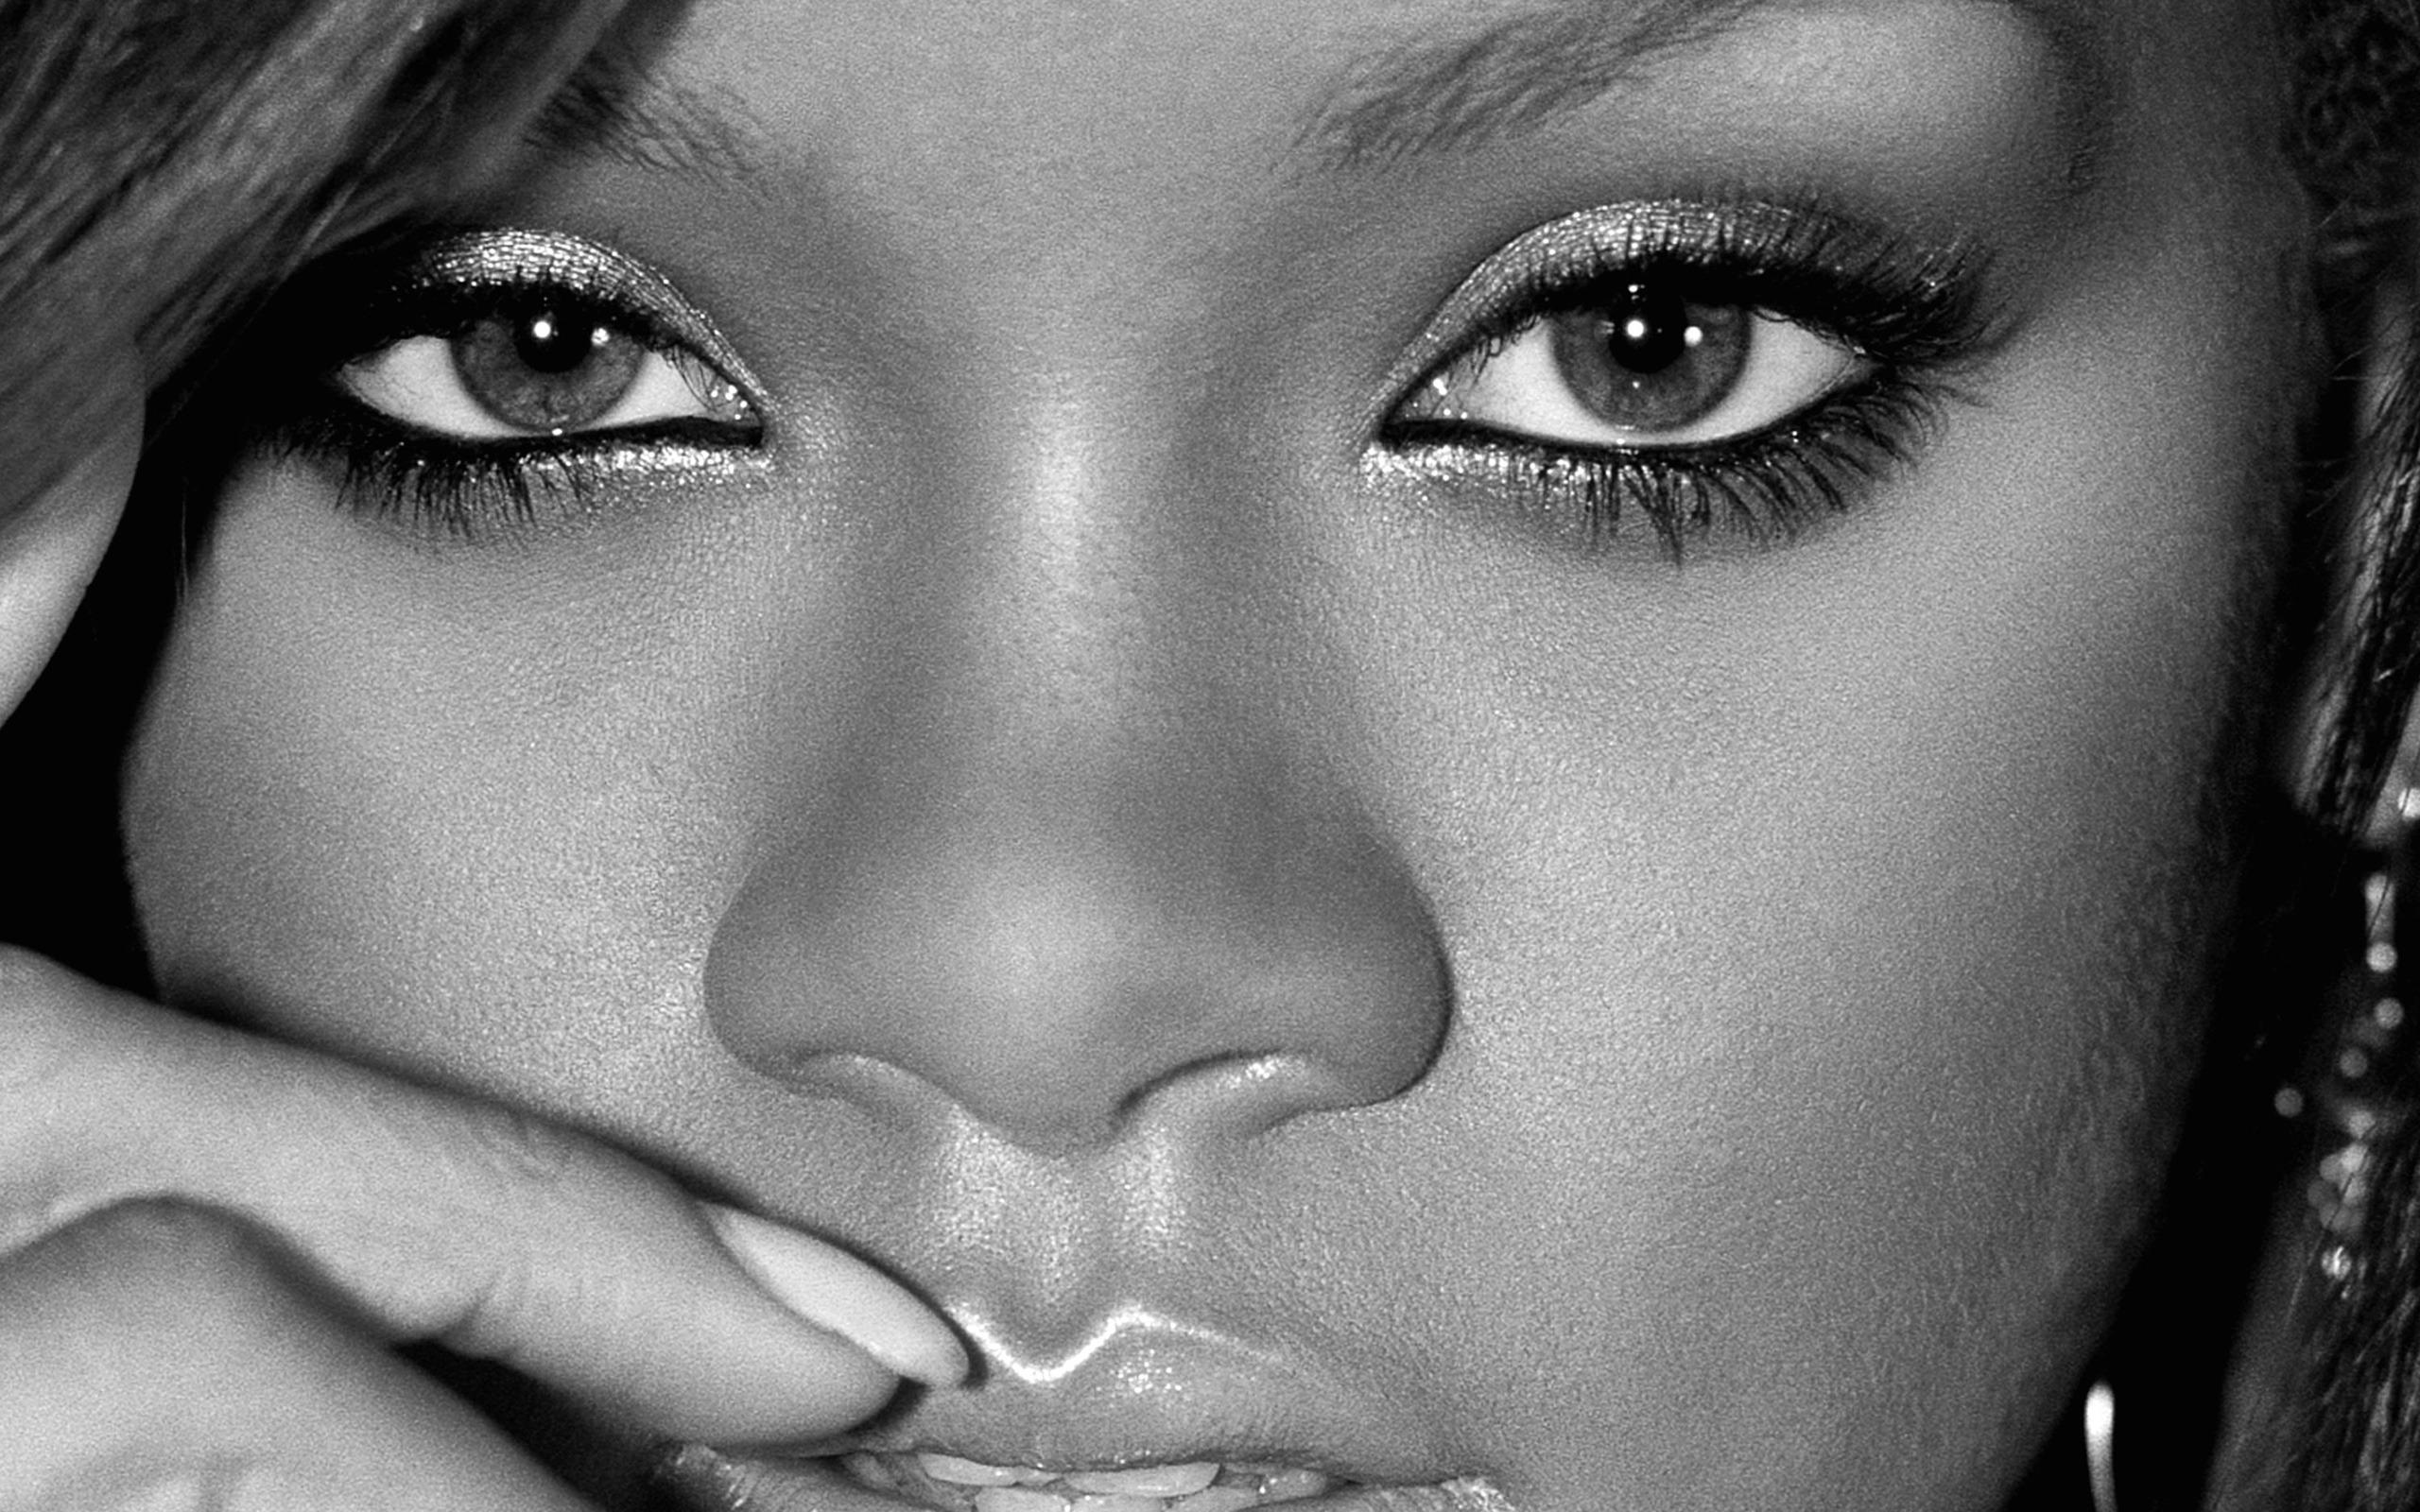 Rihanna full hd wallpaper and background image 2560x1600 id169254 music rihanna wallpaper voltagebd Images